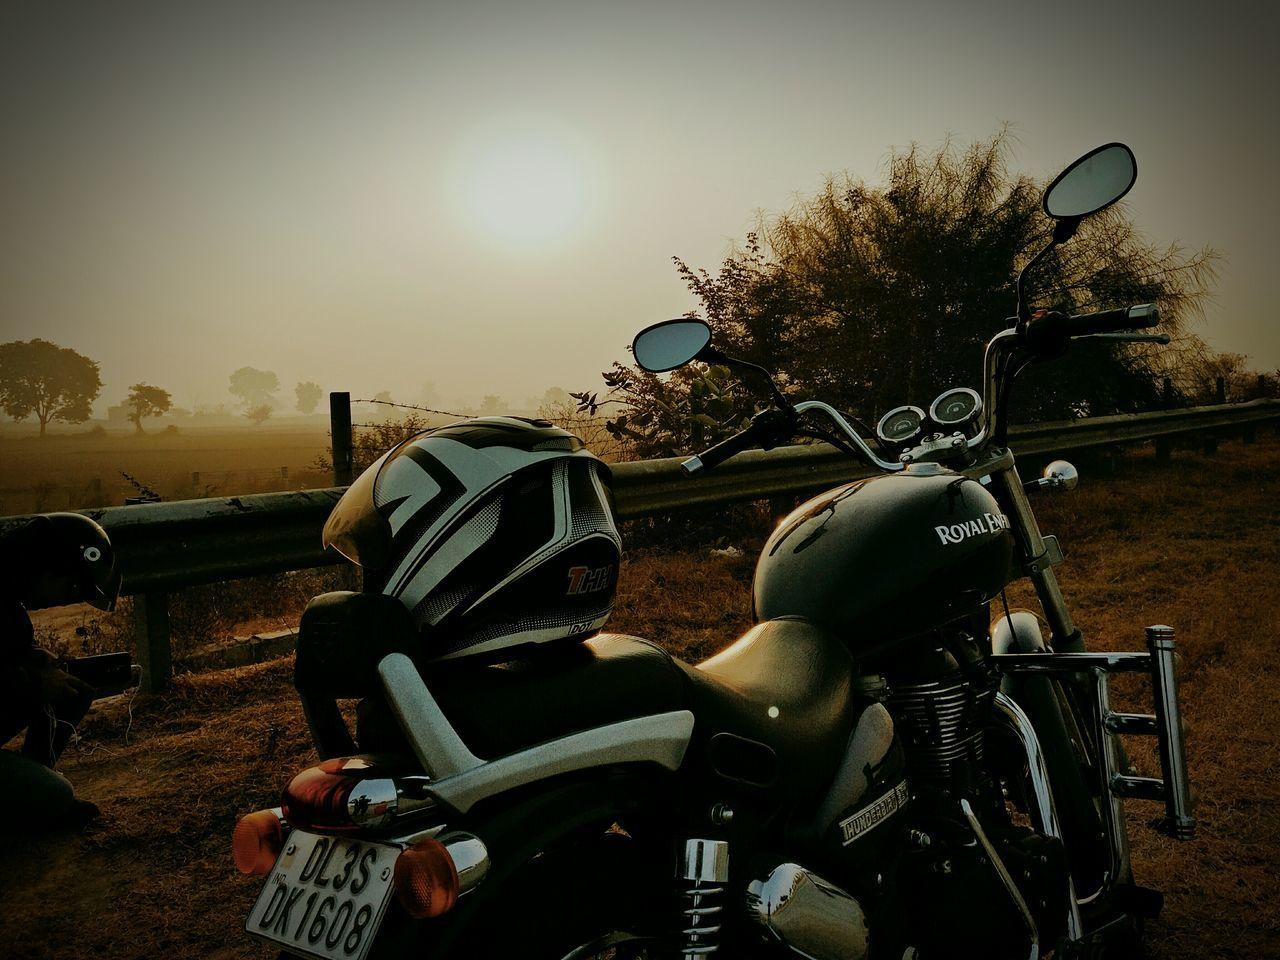 Outdoors Sunset Roadtrip Highway Biketour Bikeride Biketrip Cruiser Bikes